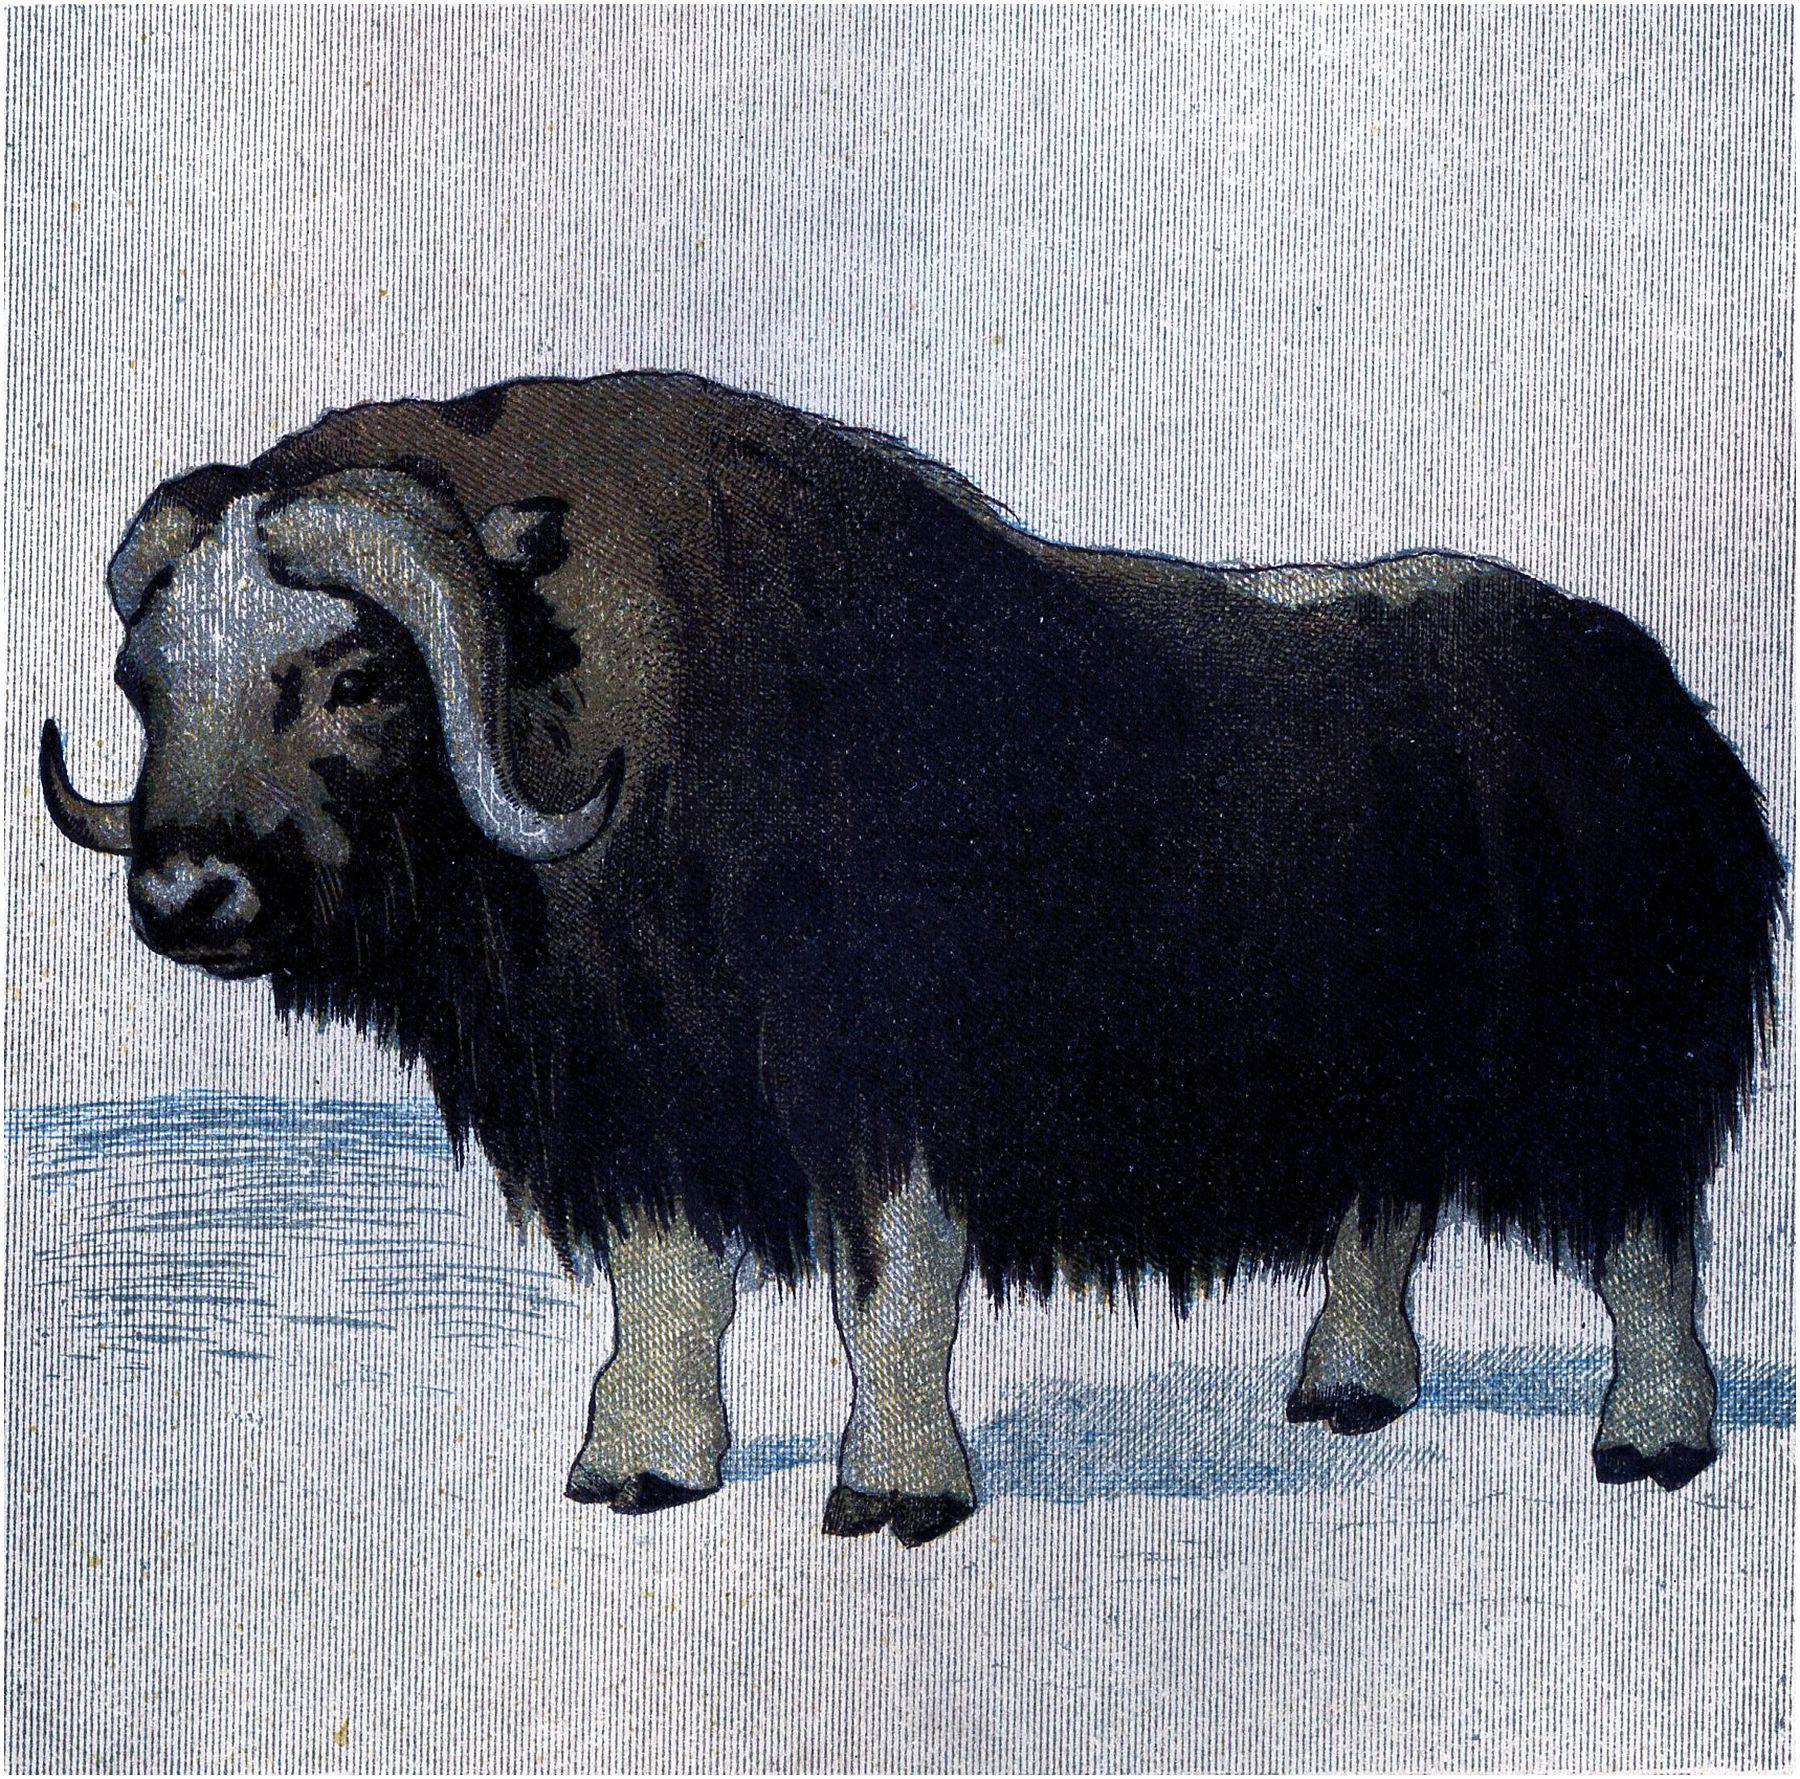 Bison clipart muskox. Vintage musk ox image